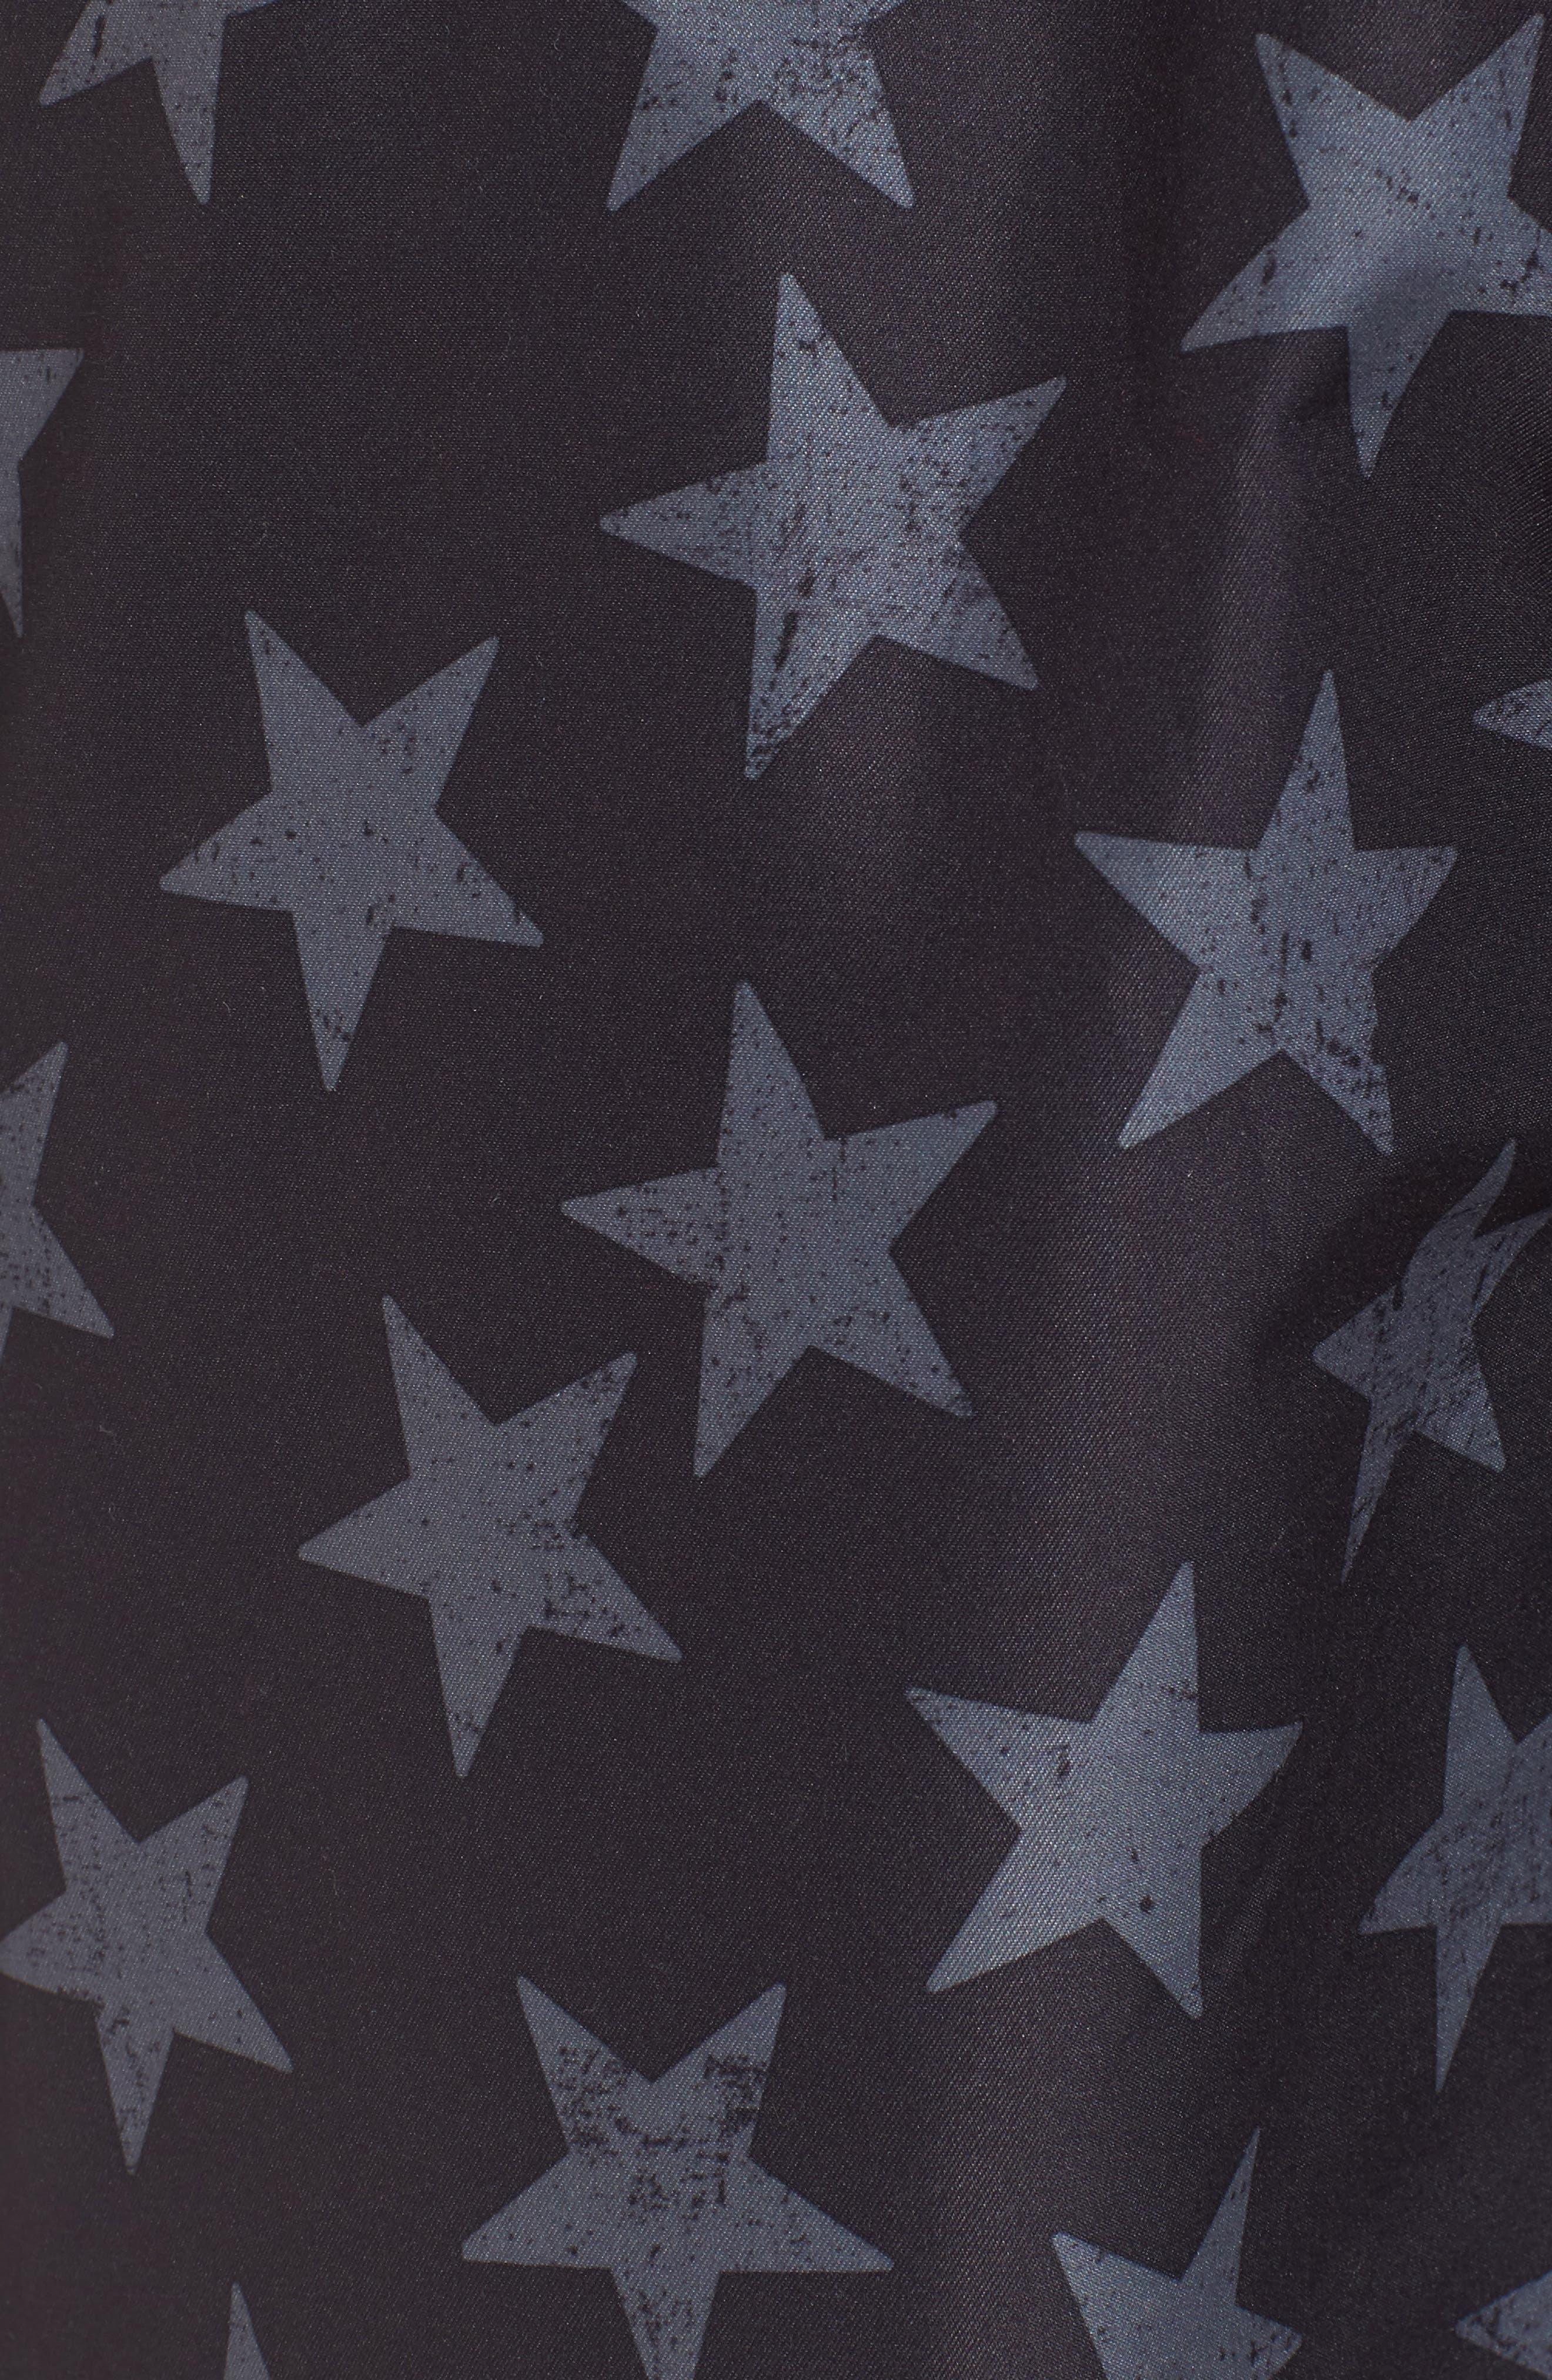 San O Stars Swim Trunks,                             Alternate thumbnail 5, color,                             002